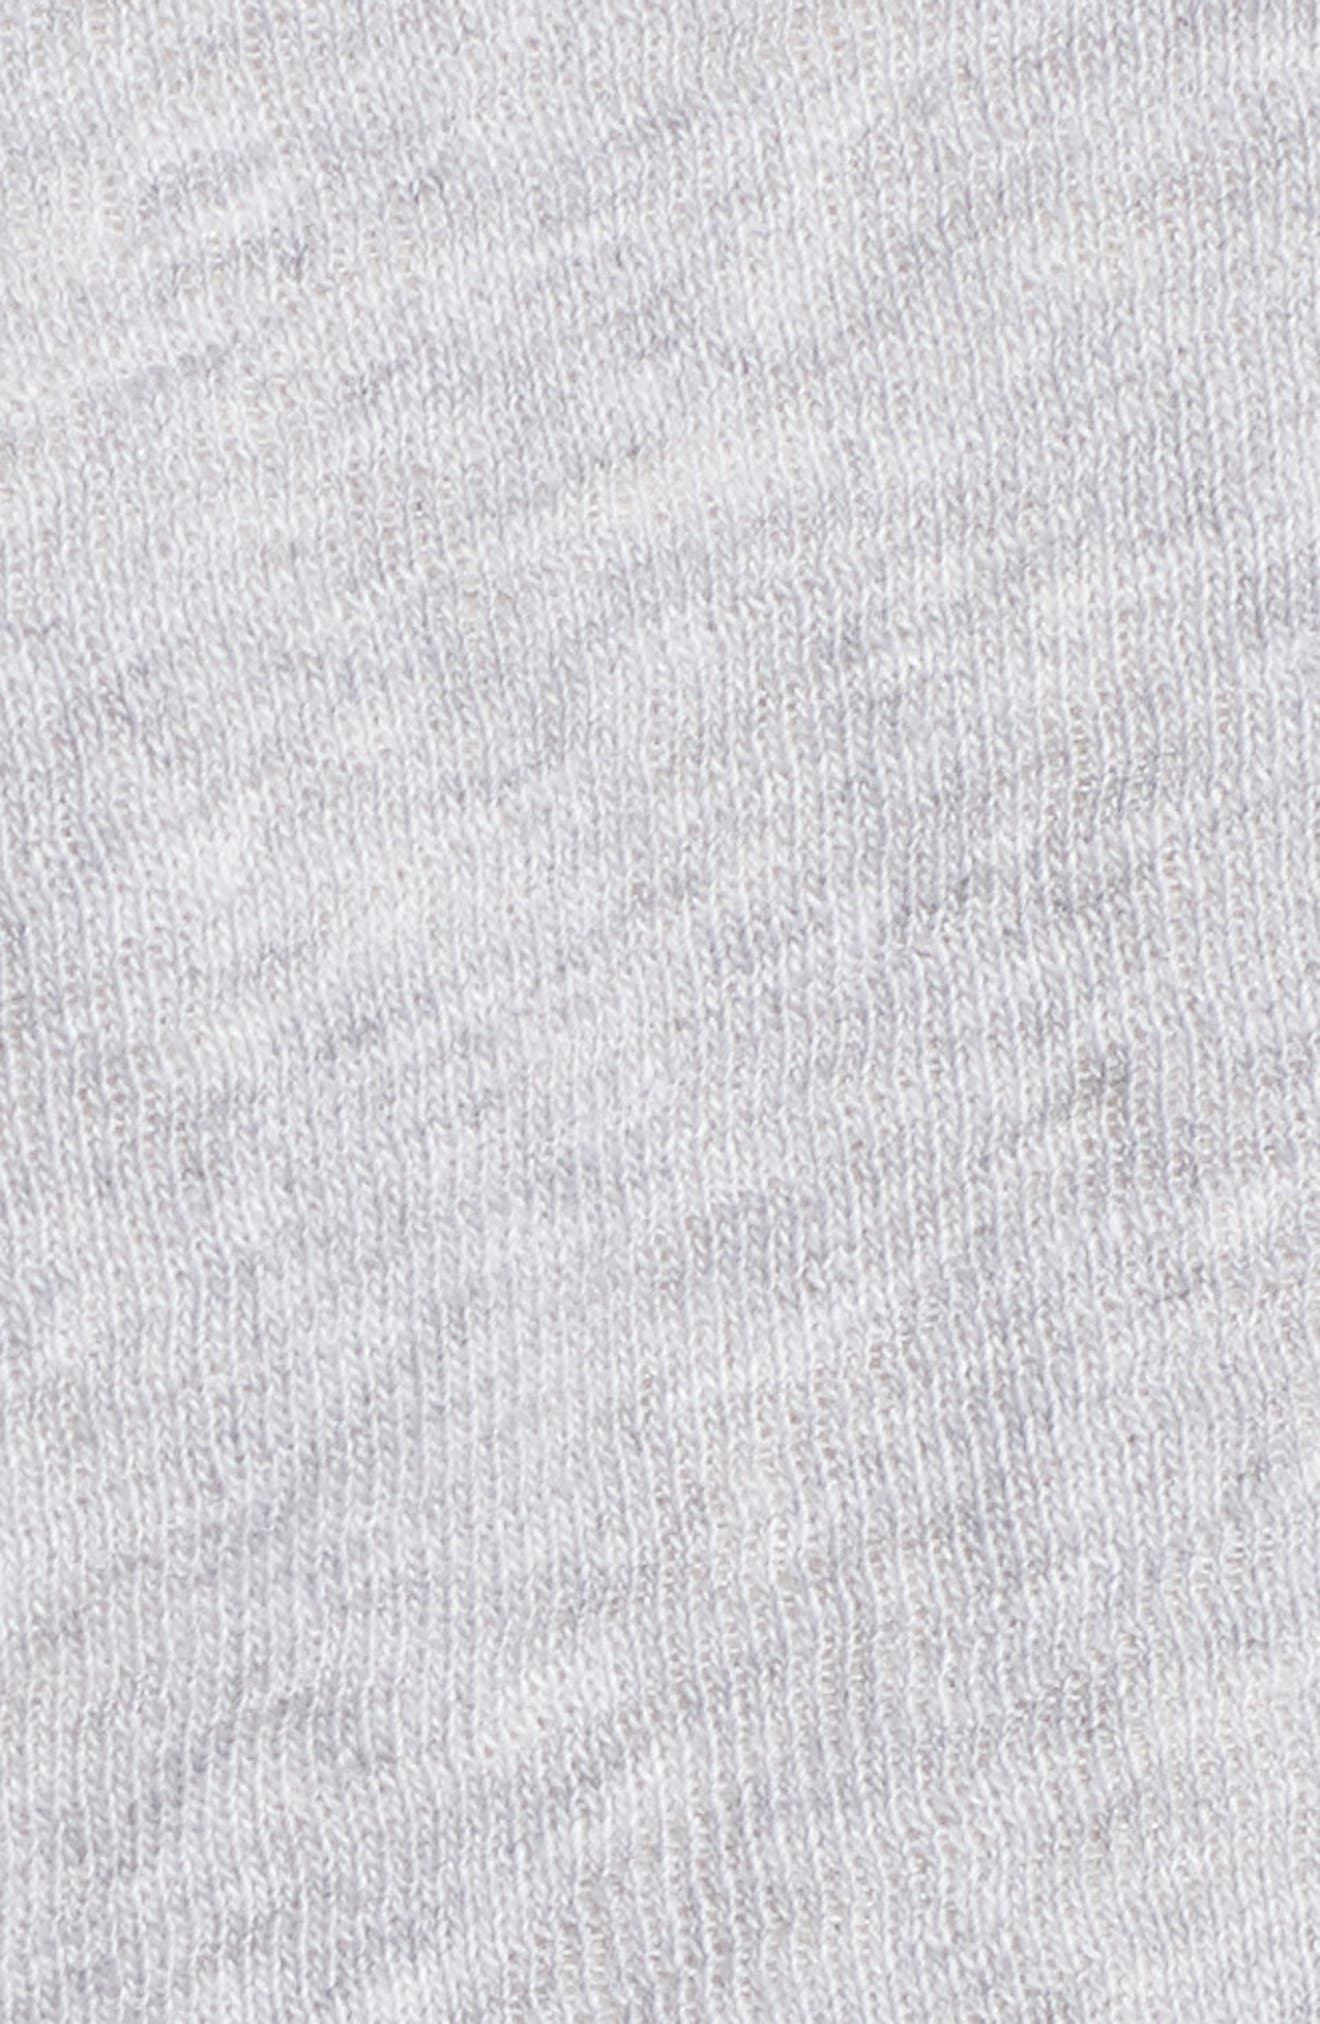 Organic Cotton Knit Hooded Jacket,                             Alternate thumbnail 5, color,